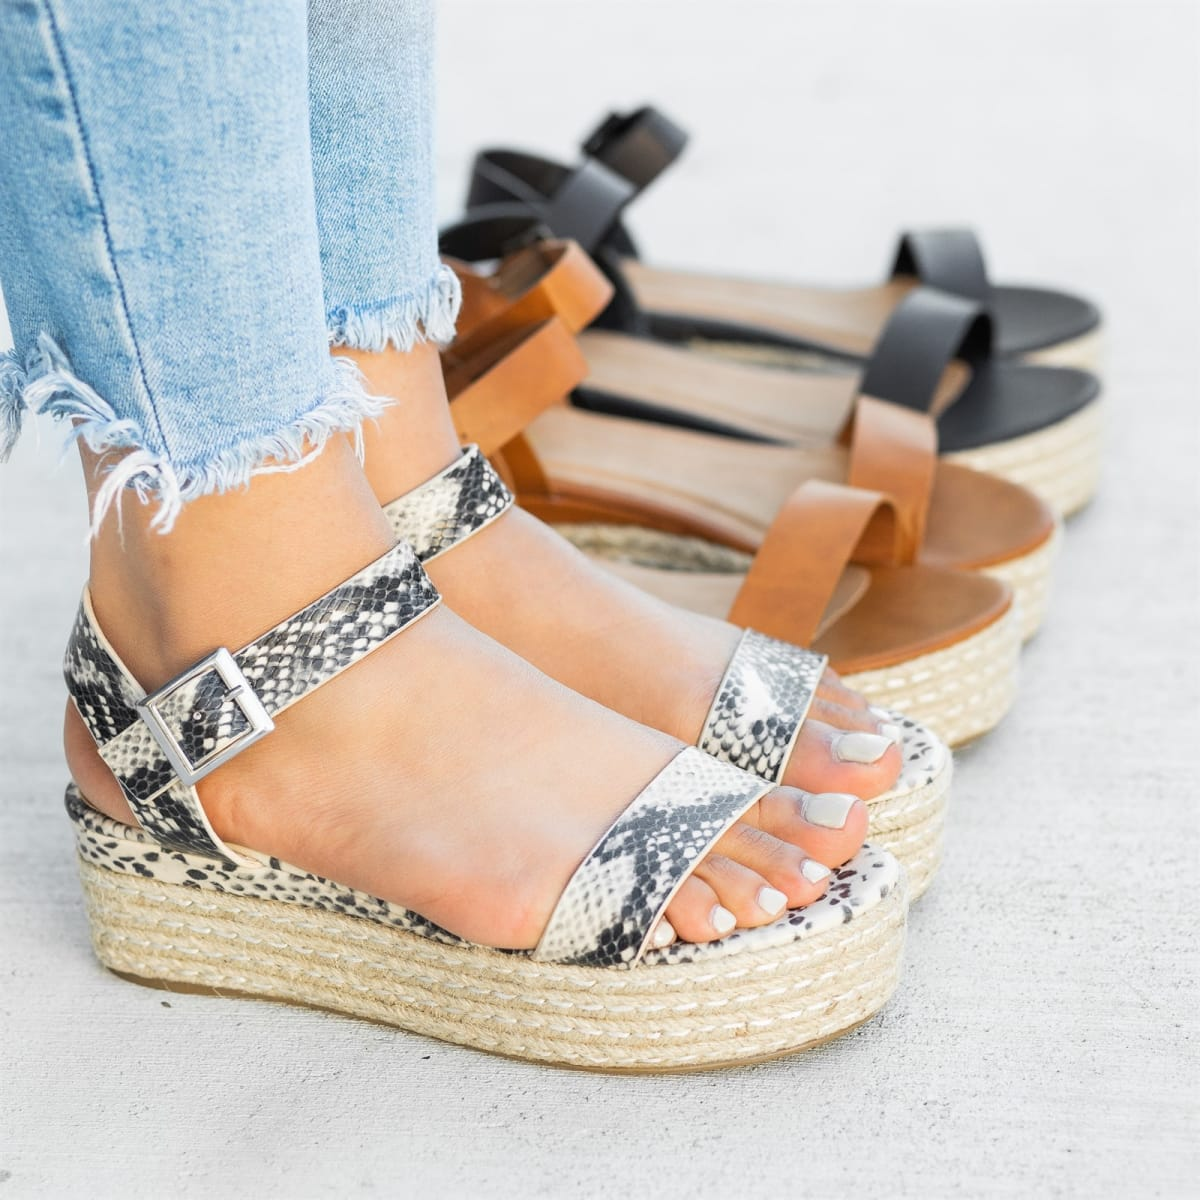 Platform Platform Espadrille Platform Chic Chic Espadrille Sandals Espadrille Espadrille Sandals Chic Sandals Chic Platform zVGjMqLSUp